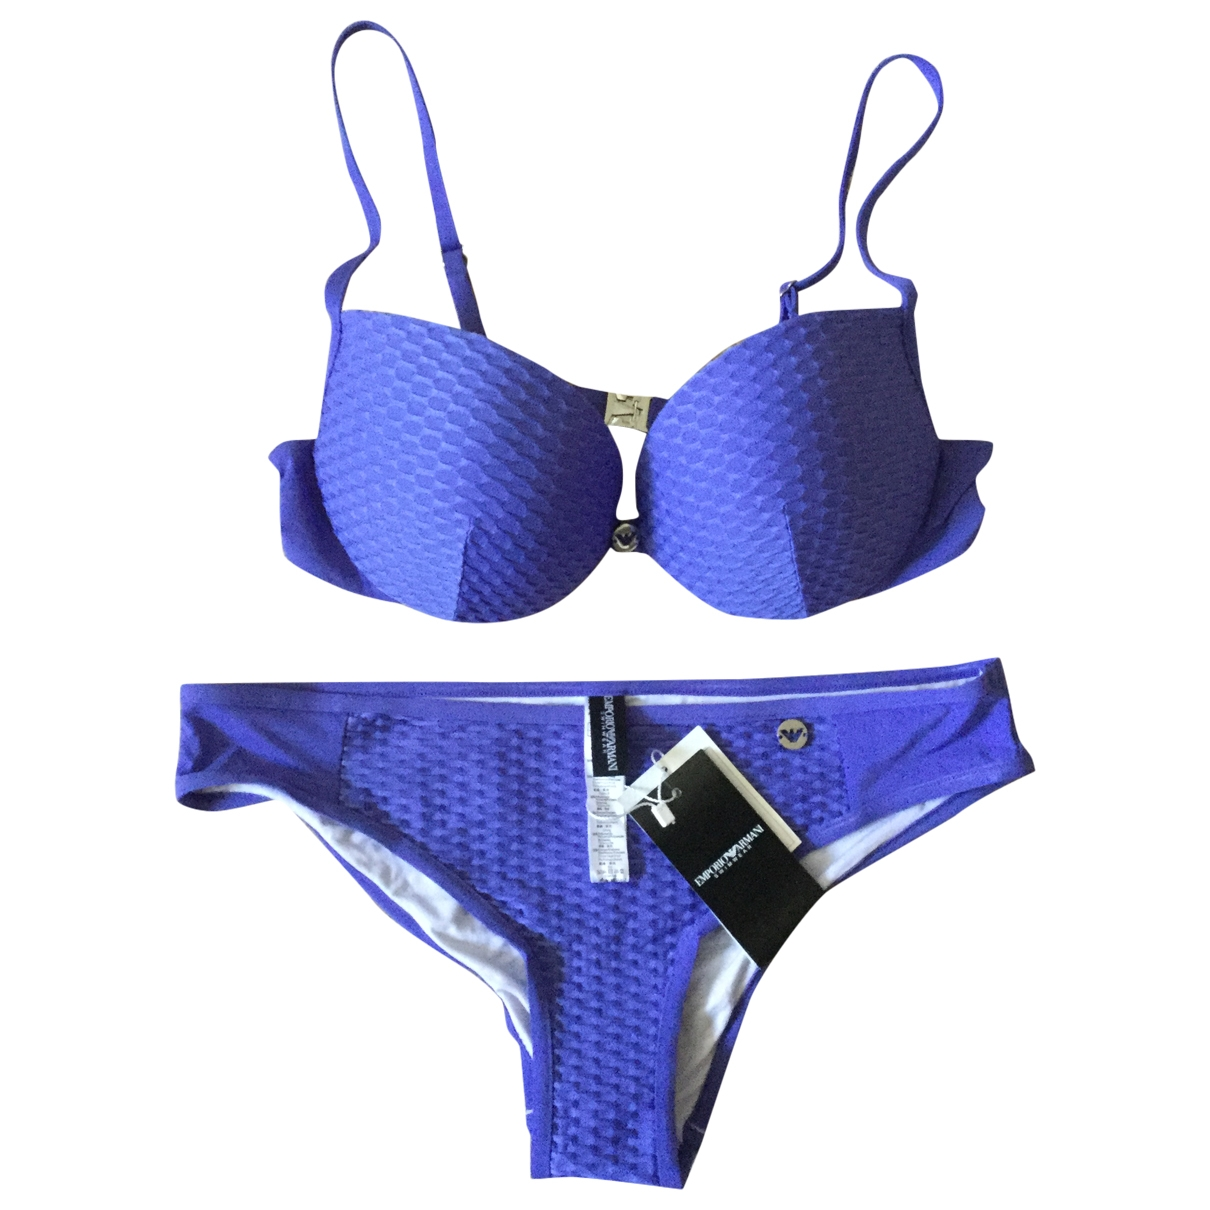 Emporio Armani \N Badeanzug in  Lila Polyester